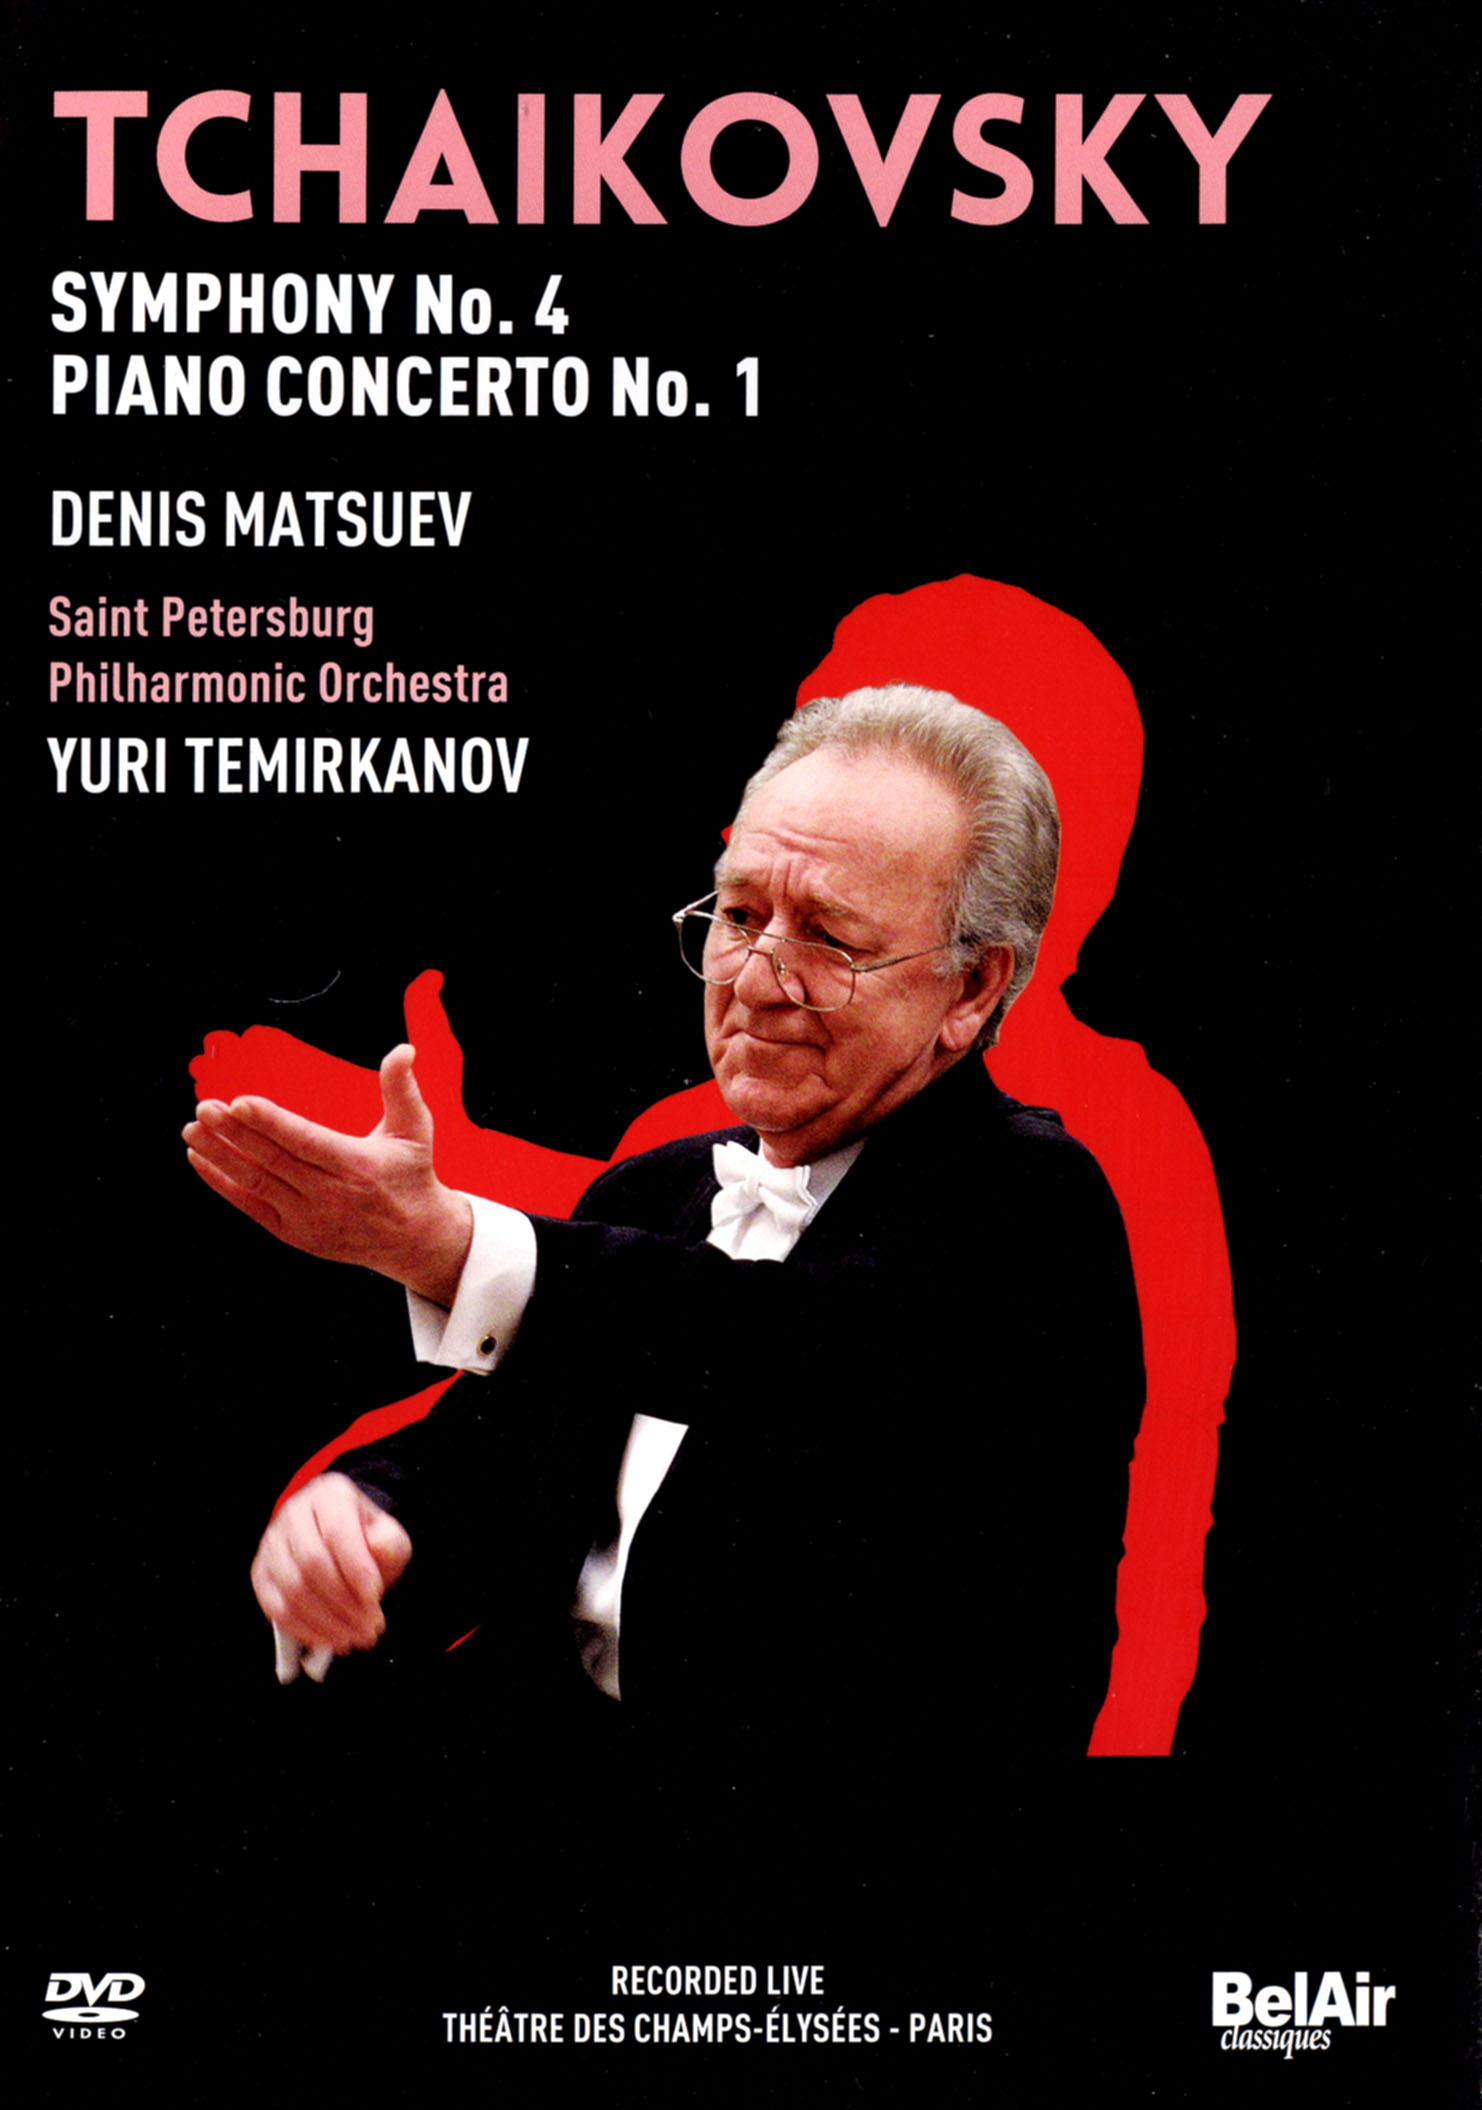 Saint Petersburg Philharmonic Orchestra/Yuri Temirkanov: Tchaikovsky - Symphony No. 4/Piano Concerto